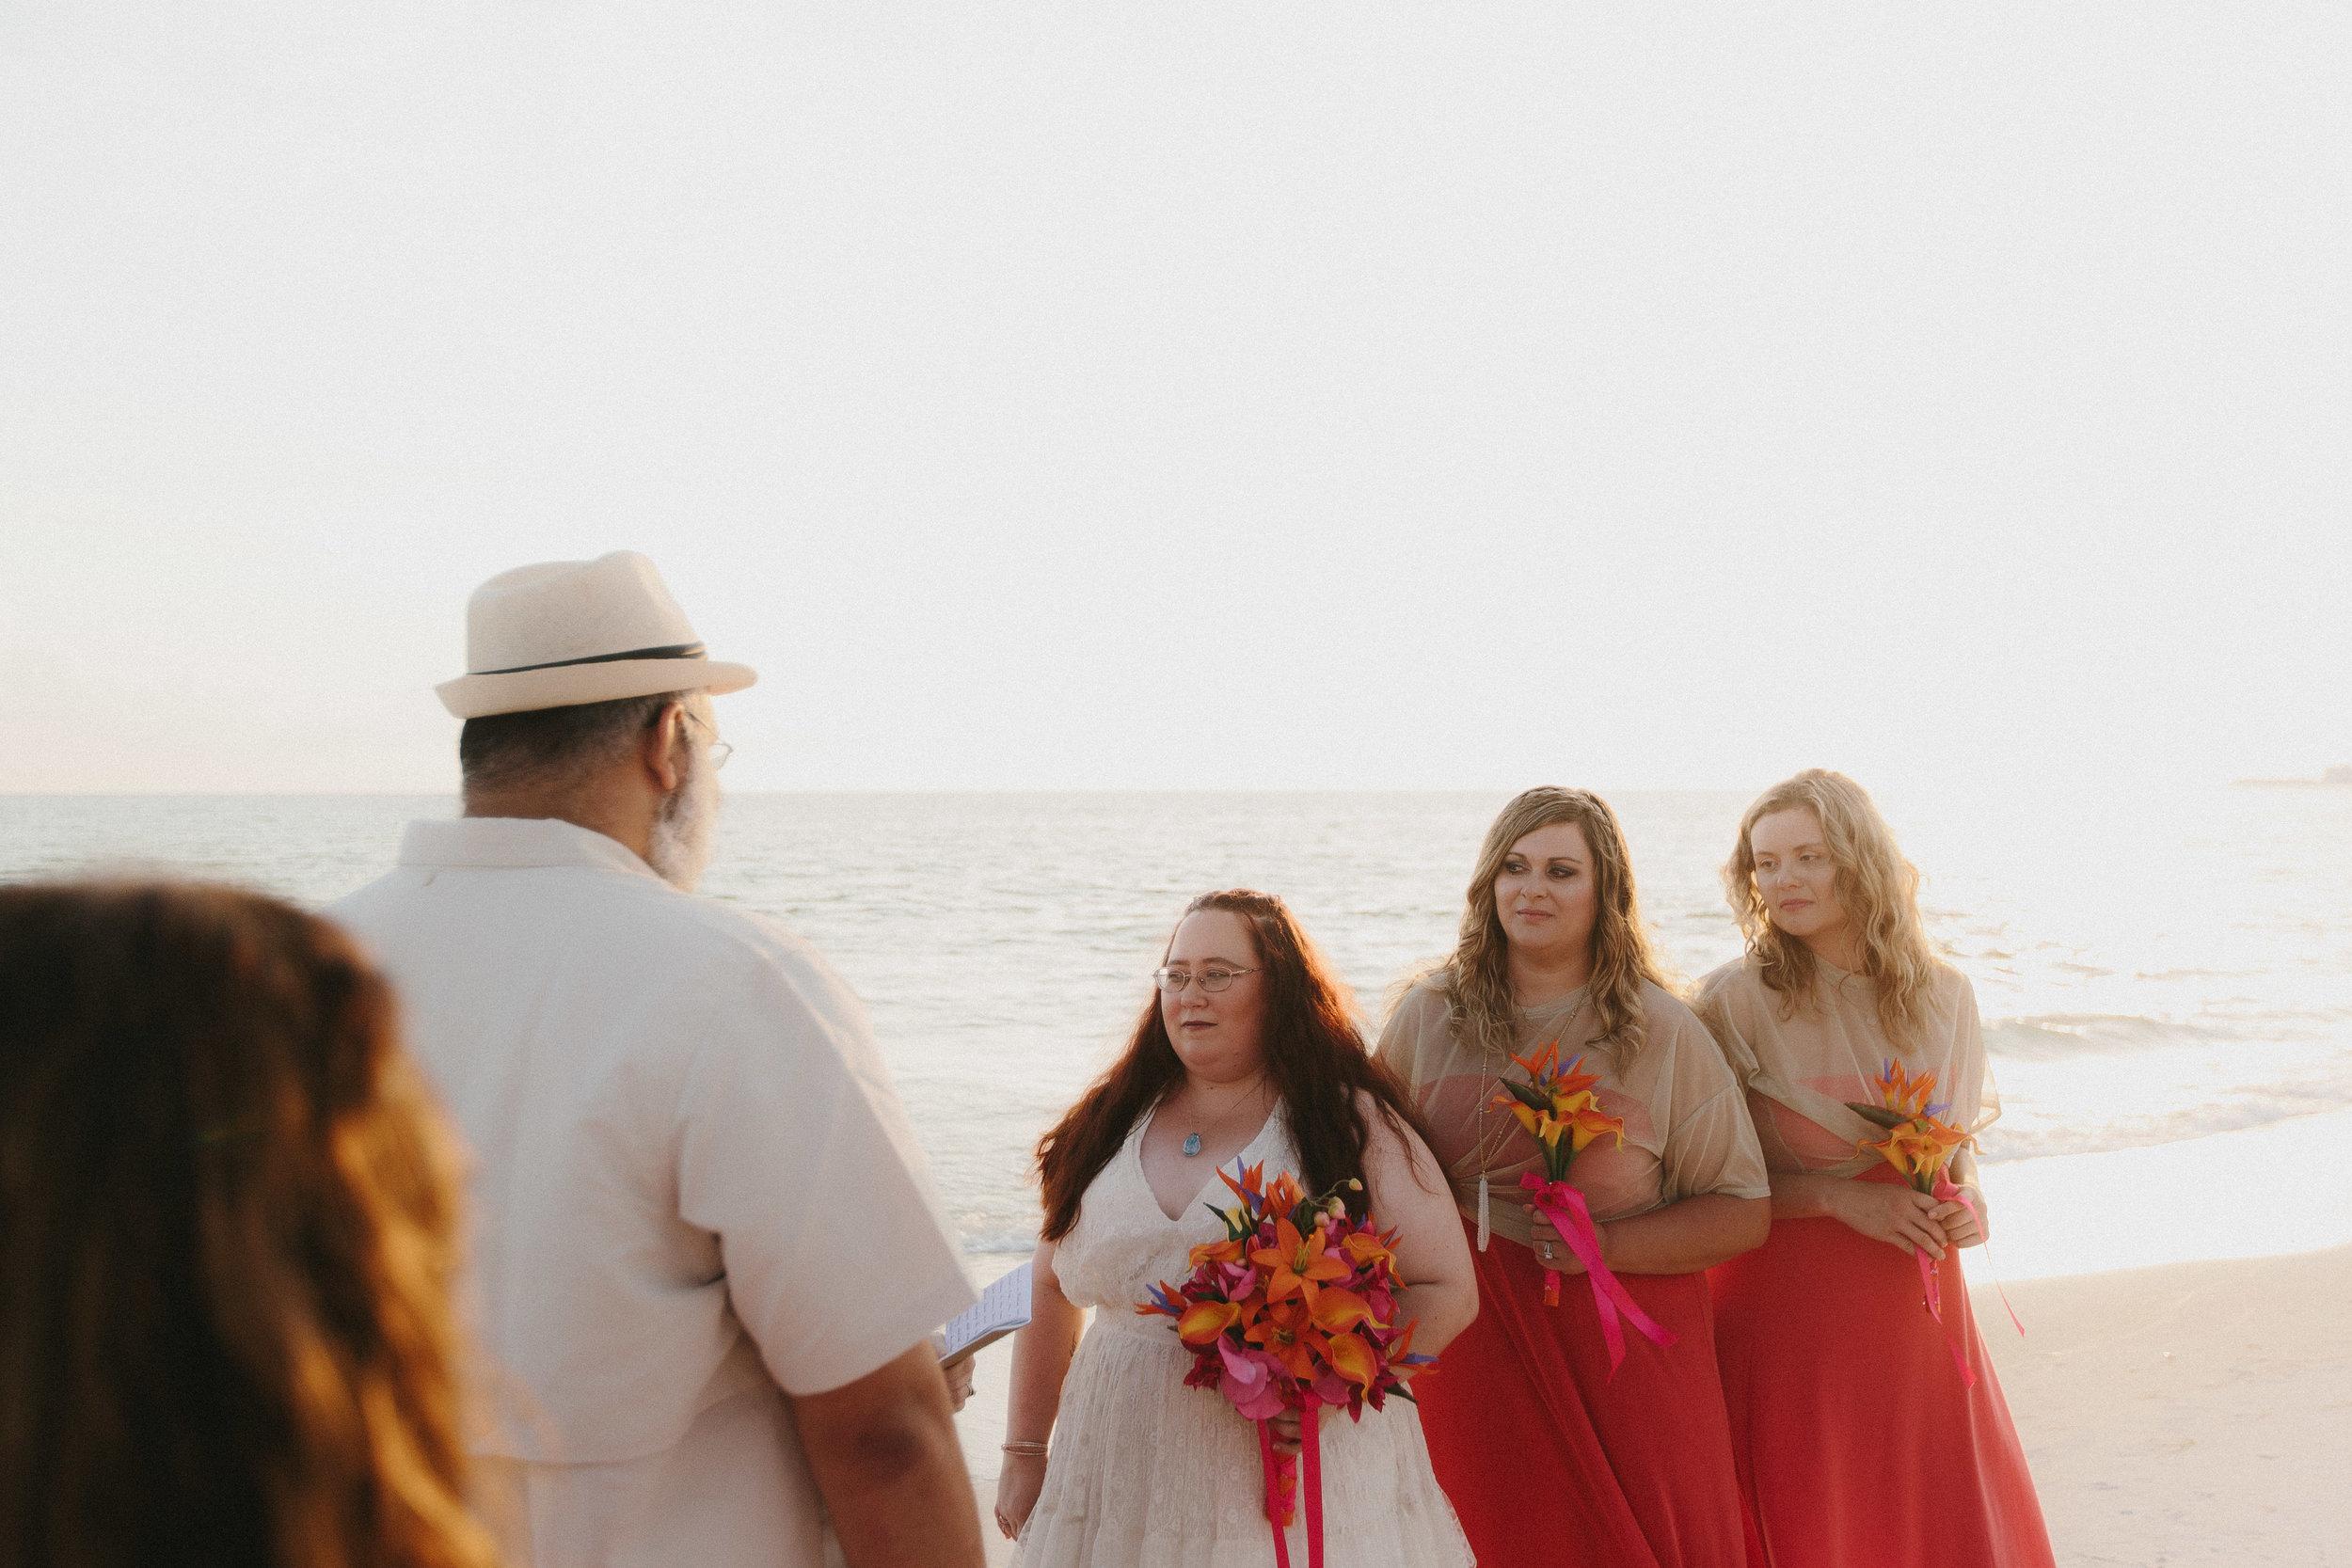 destin_sunset_beach_elopement_intimate_wedding_photographer_florida_documentary_1163.jpg